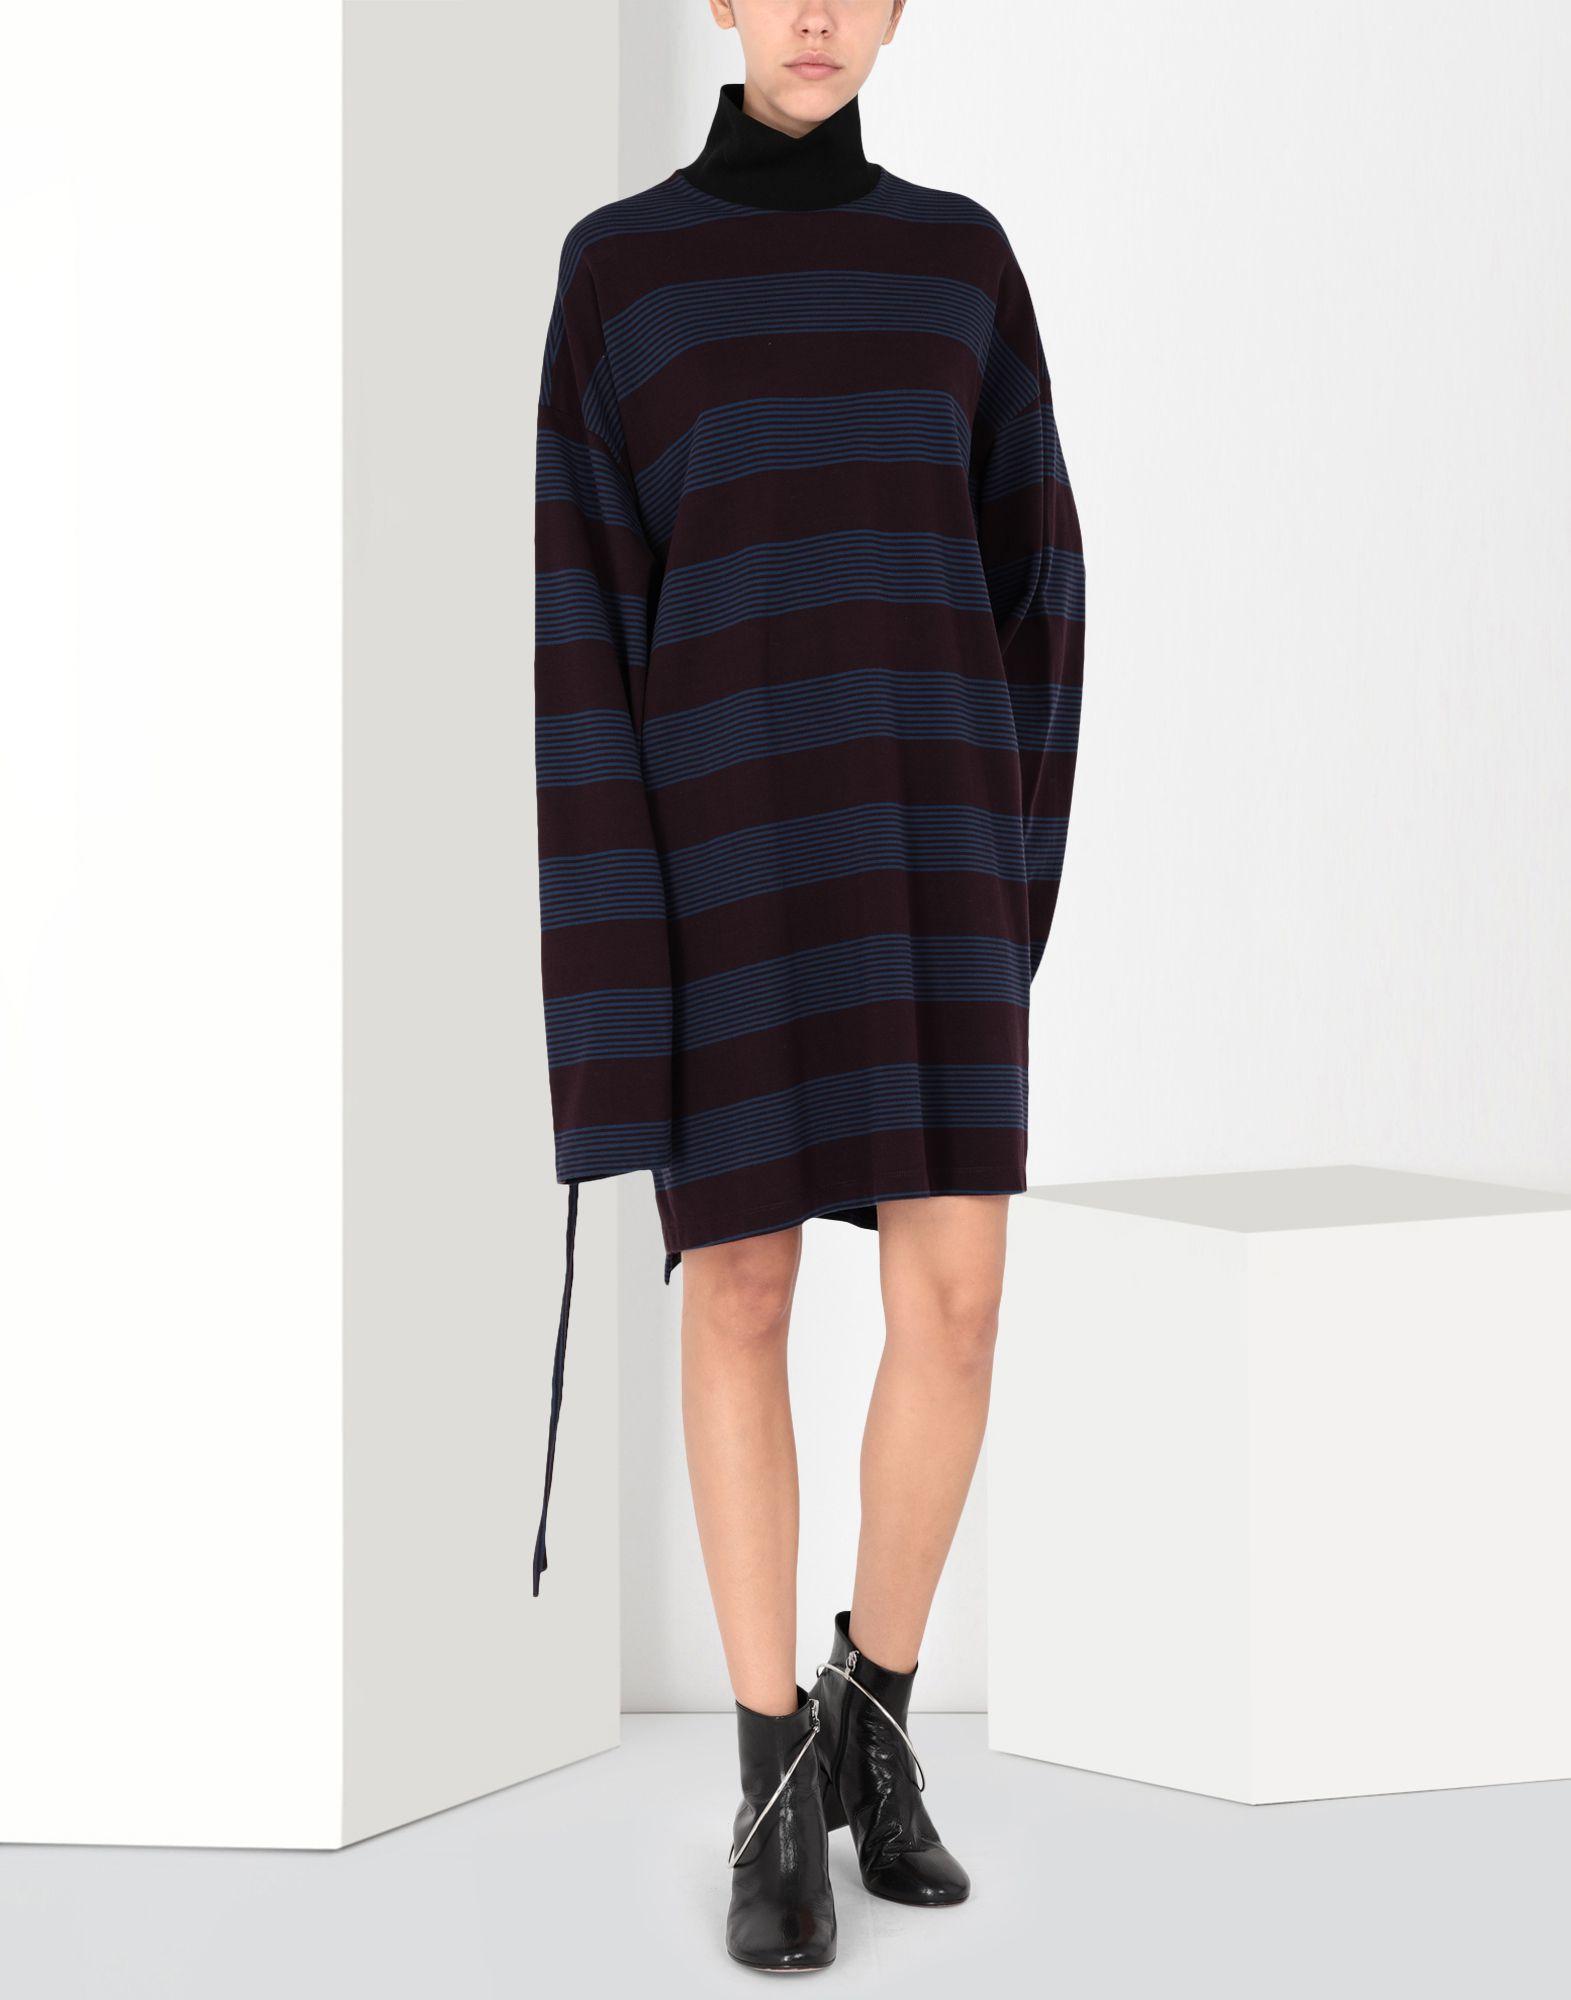 MM6 MAISON MARGIELA Striped jersey dress Short dress Woman f